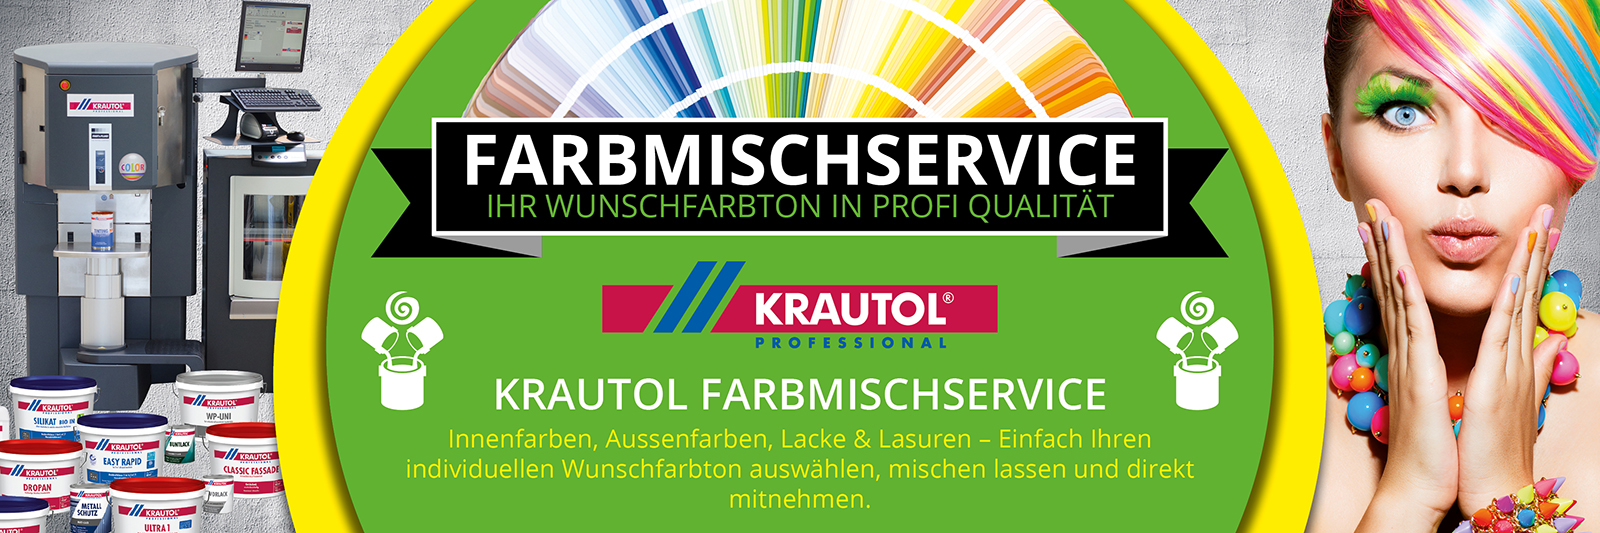 9295_Erdinger_Land_20150814_TOP Schild Farbmischservice